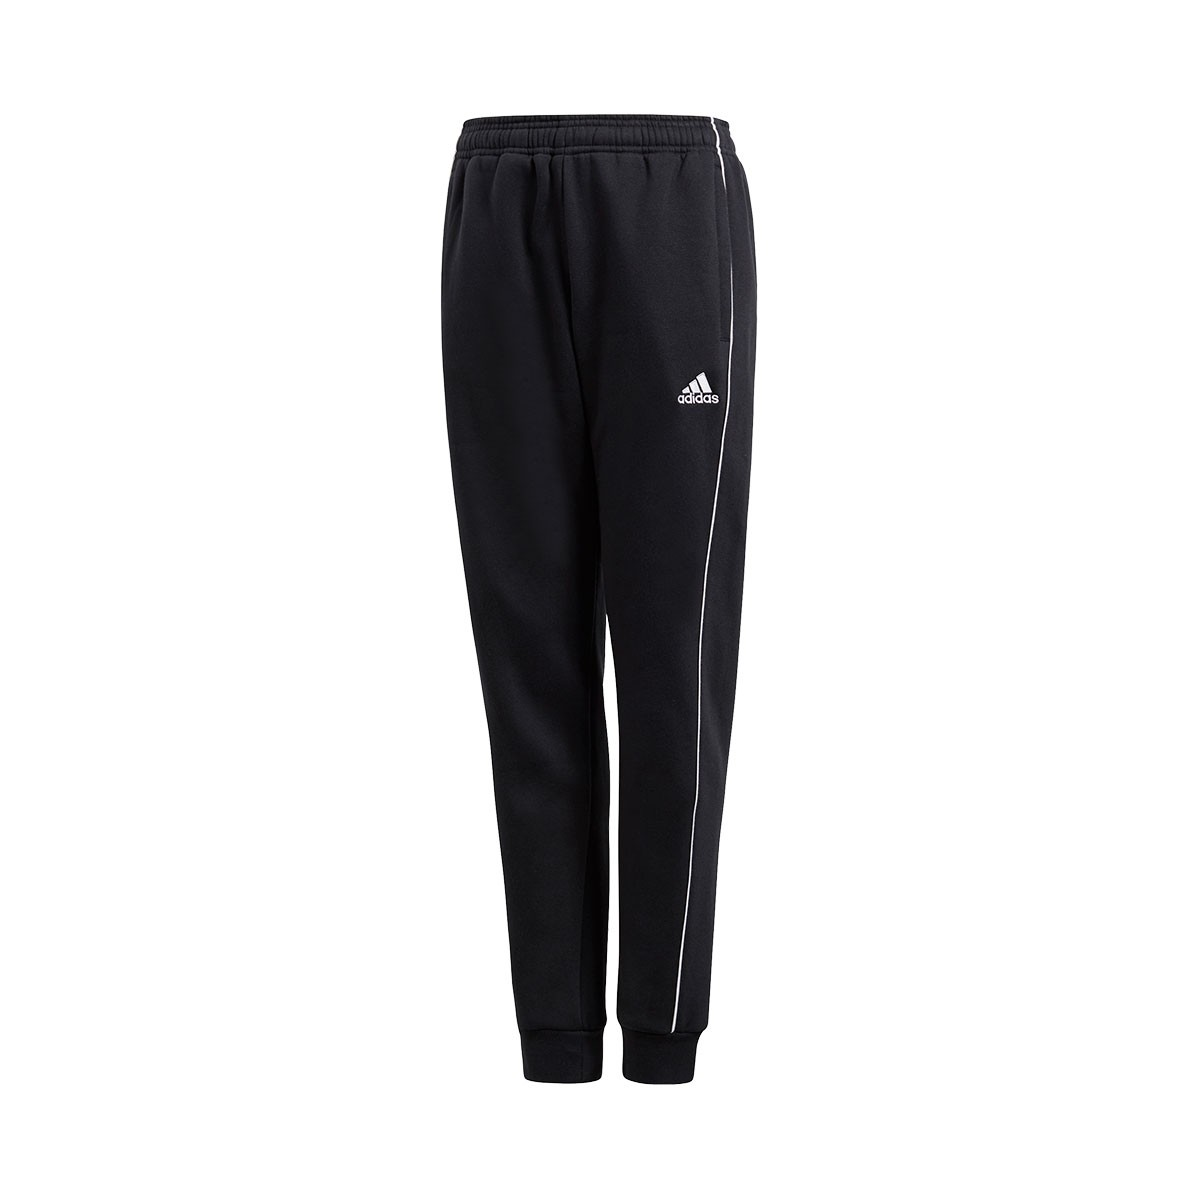 652f0ebaf Long pants adidas Kids Core 18 Black-White - Tienda de fútbol Fútbol ...